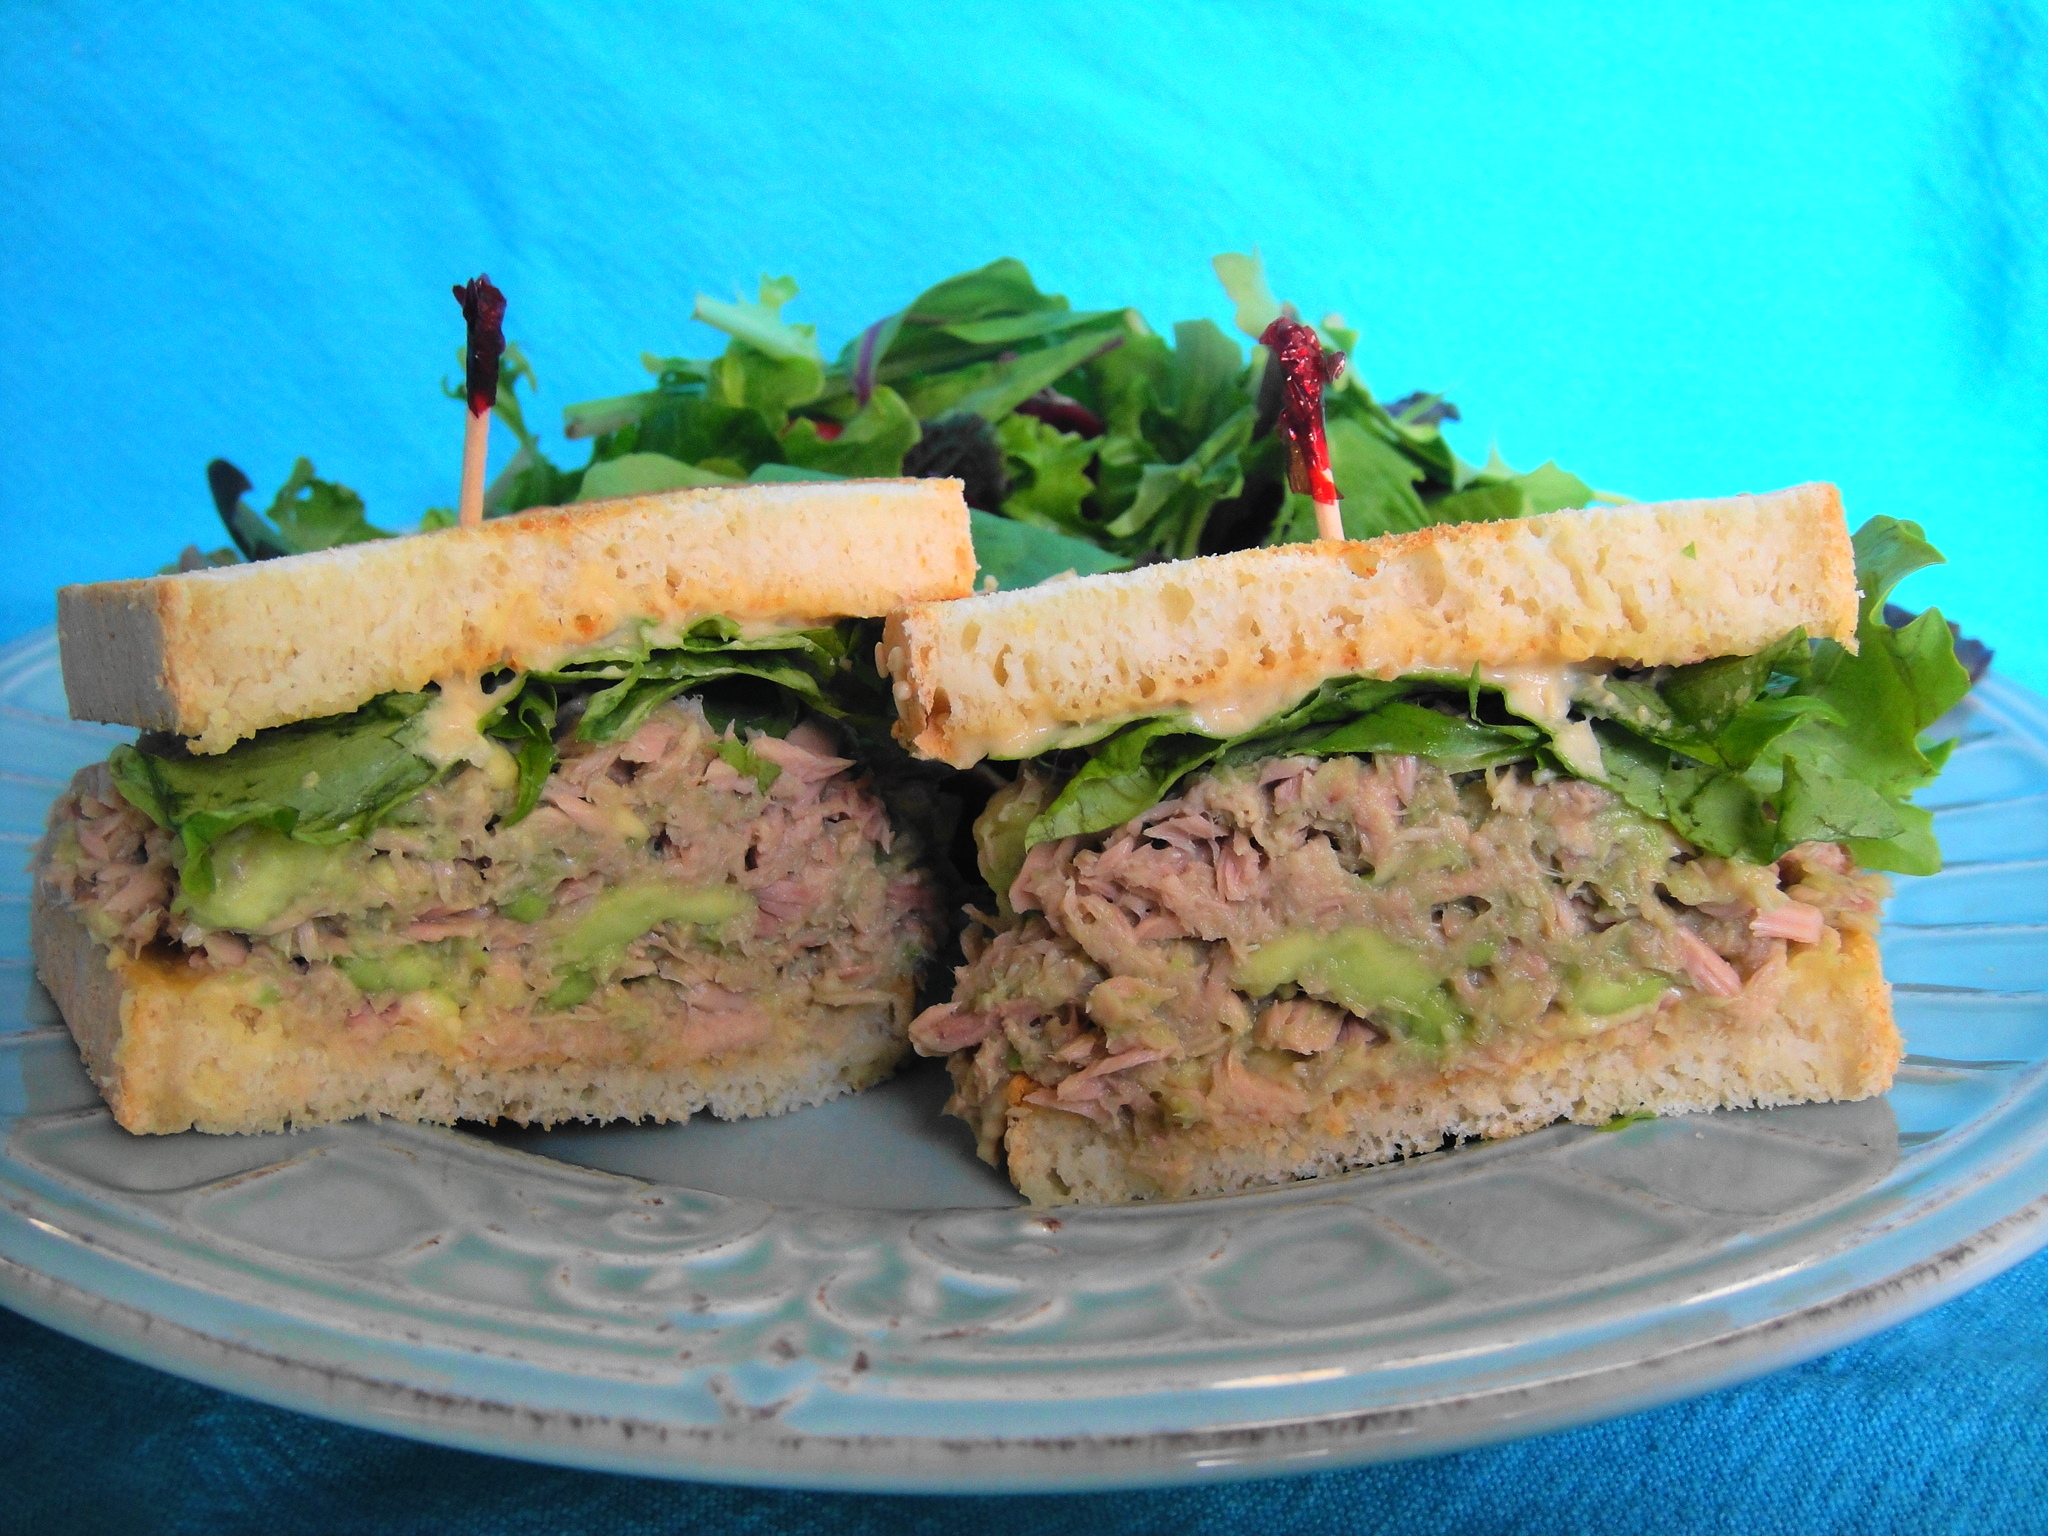 Tuna Avocado Hummus Sandwich